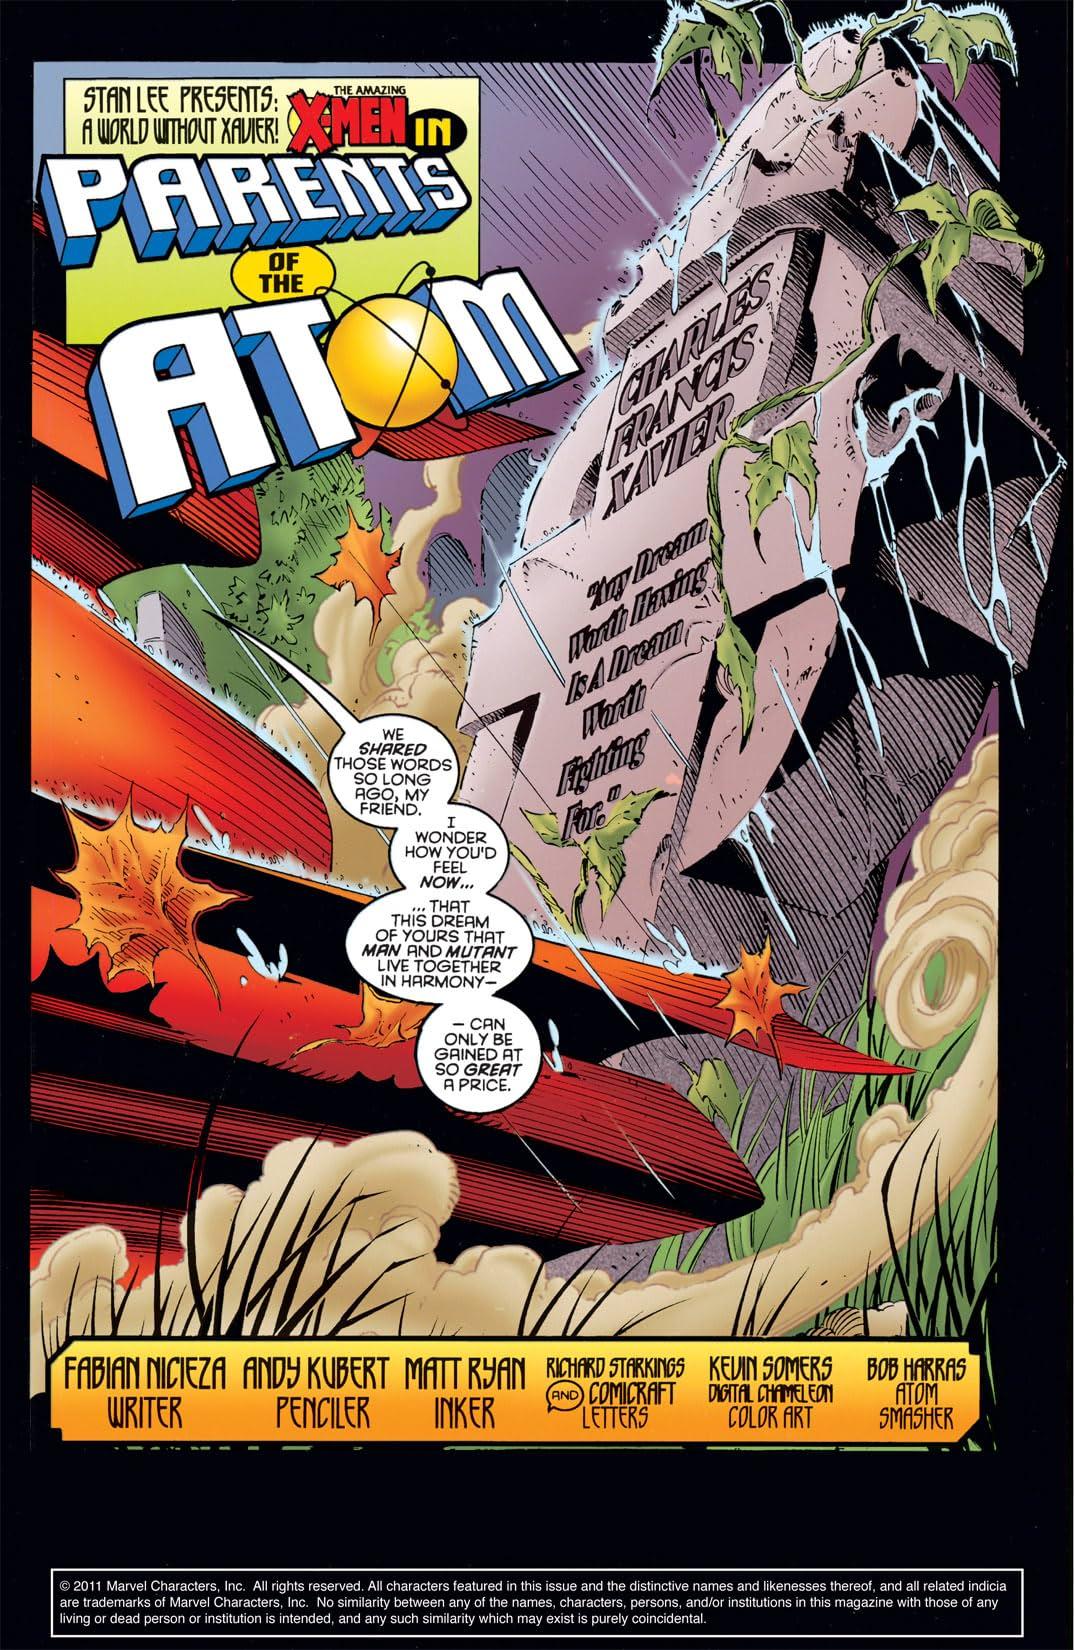 Amazing X-Men (1995) #3